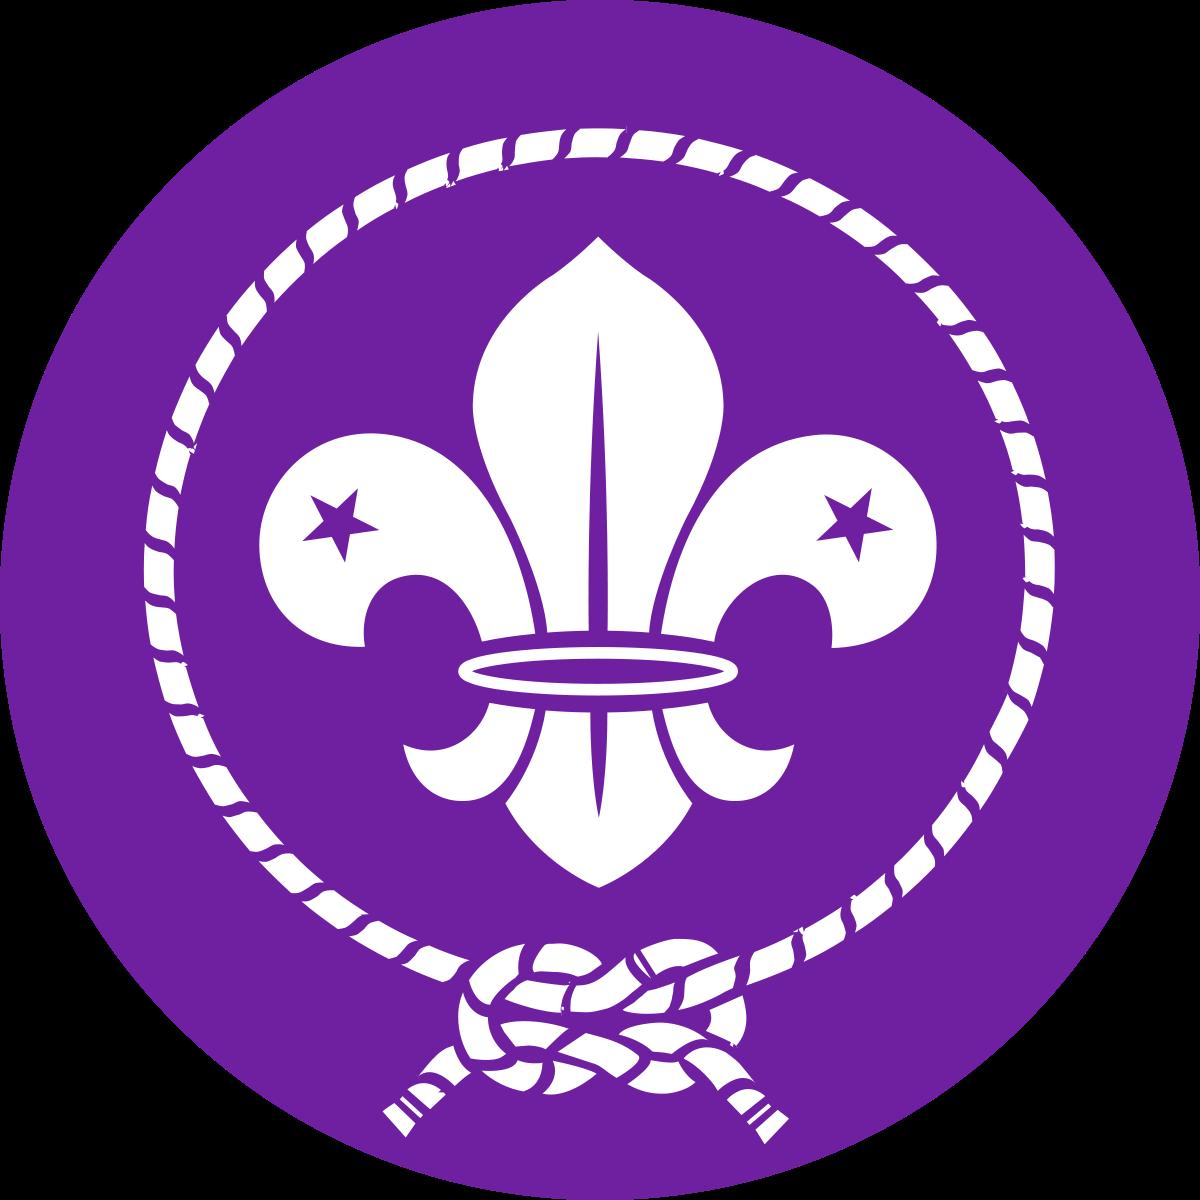 World Scout Emblem.